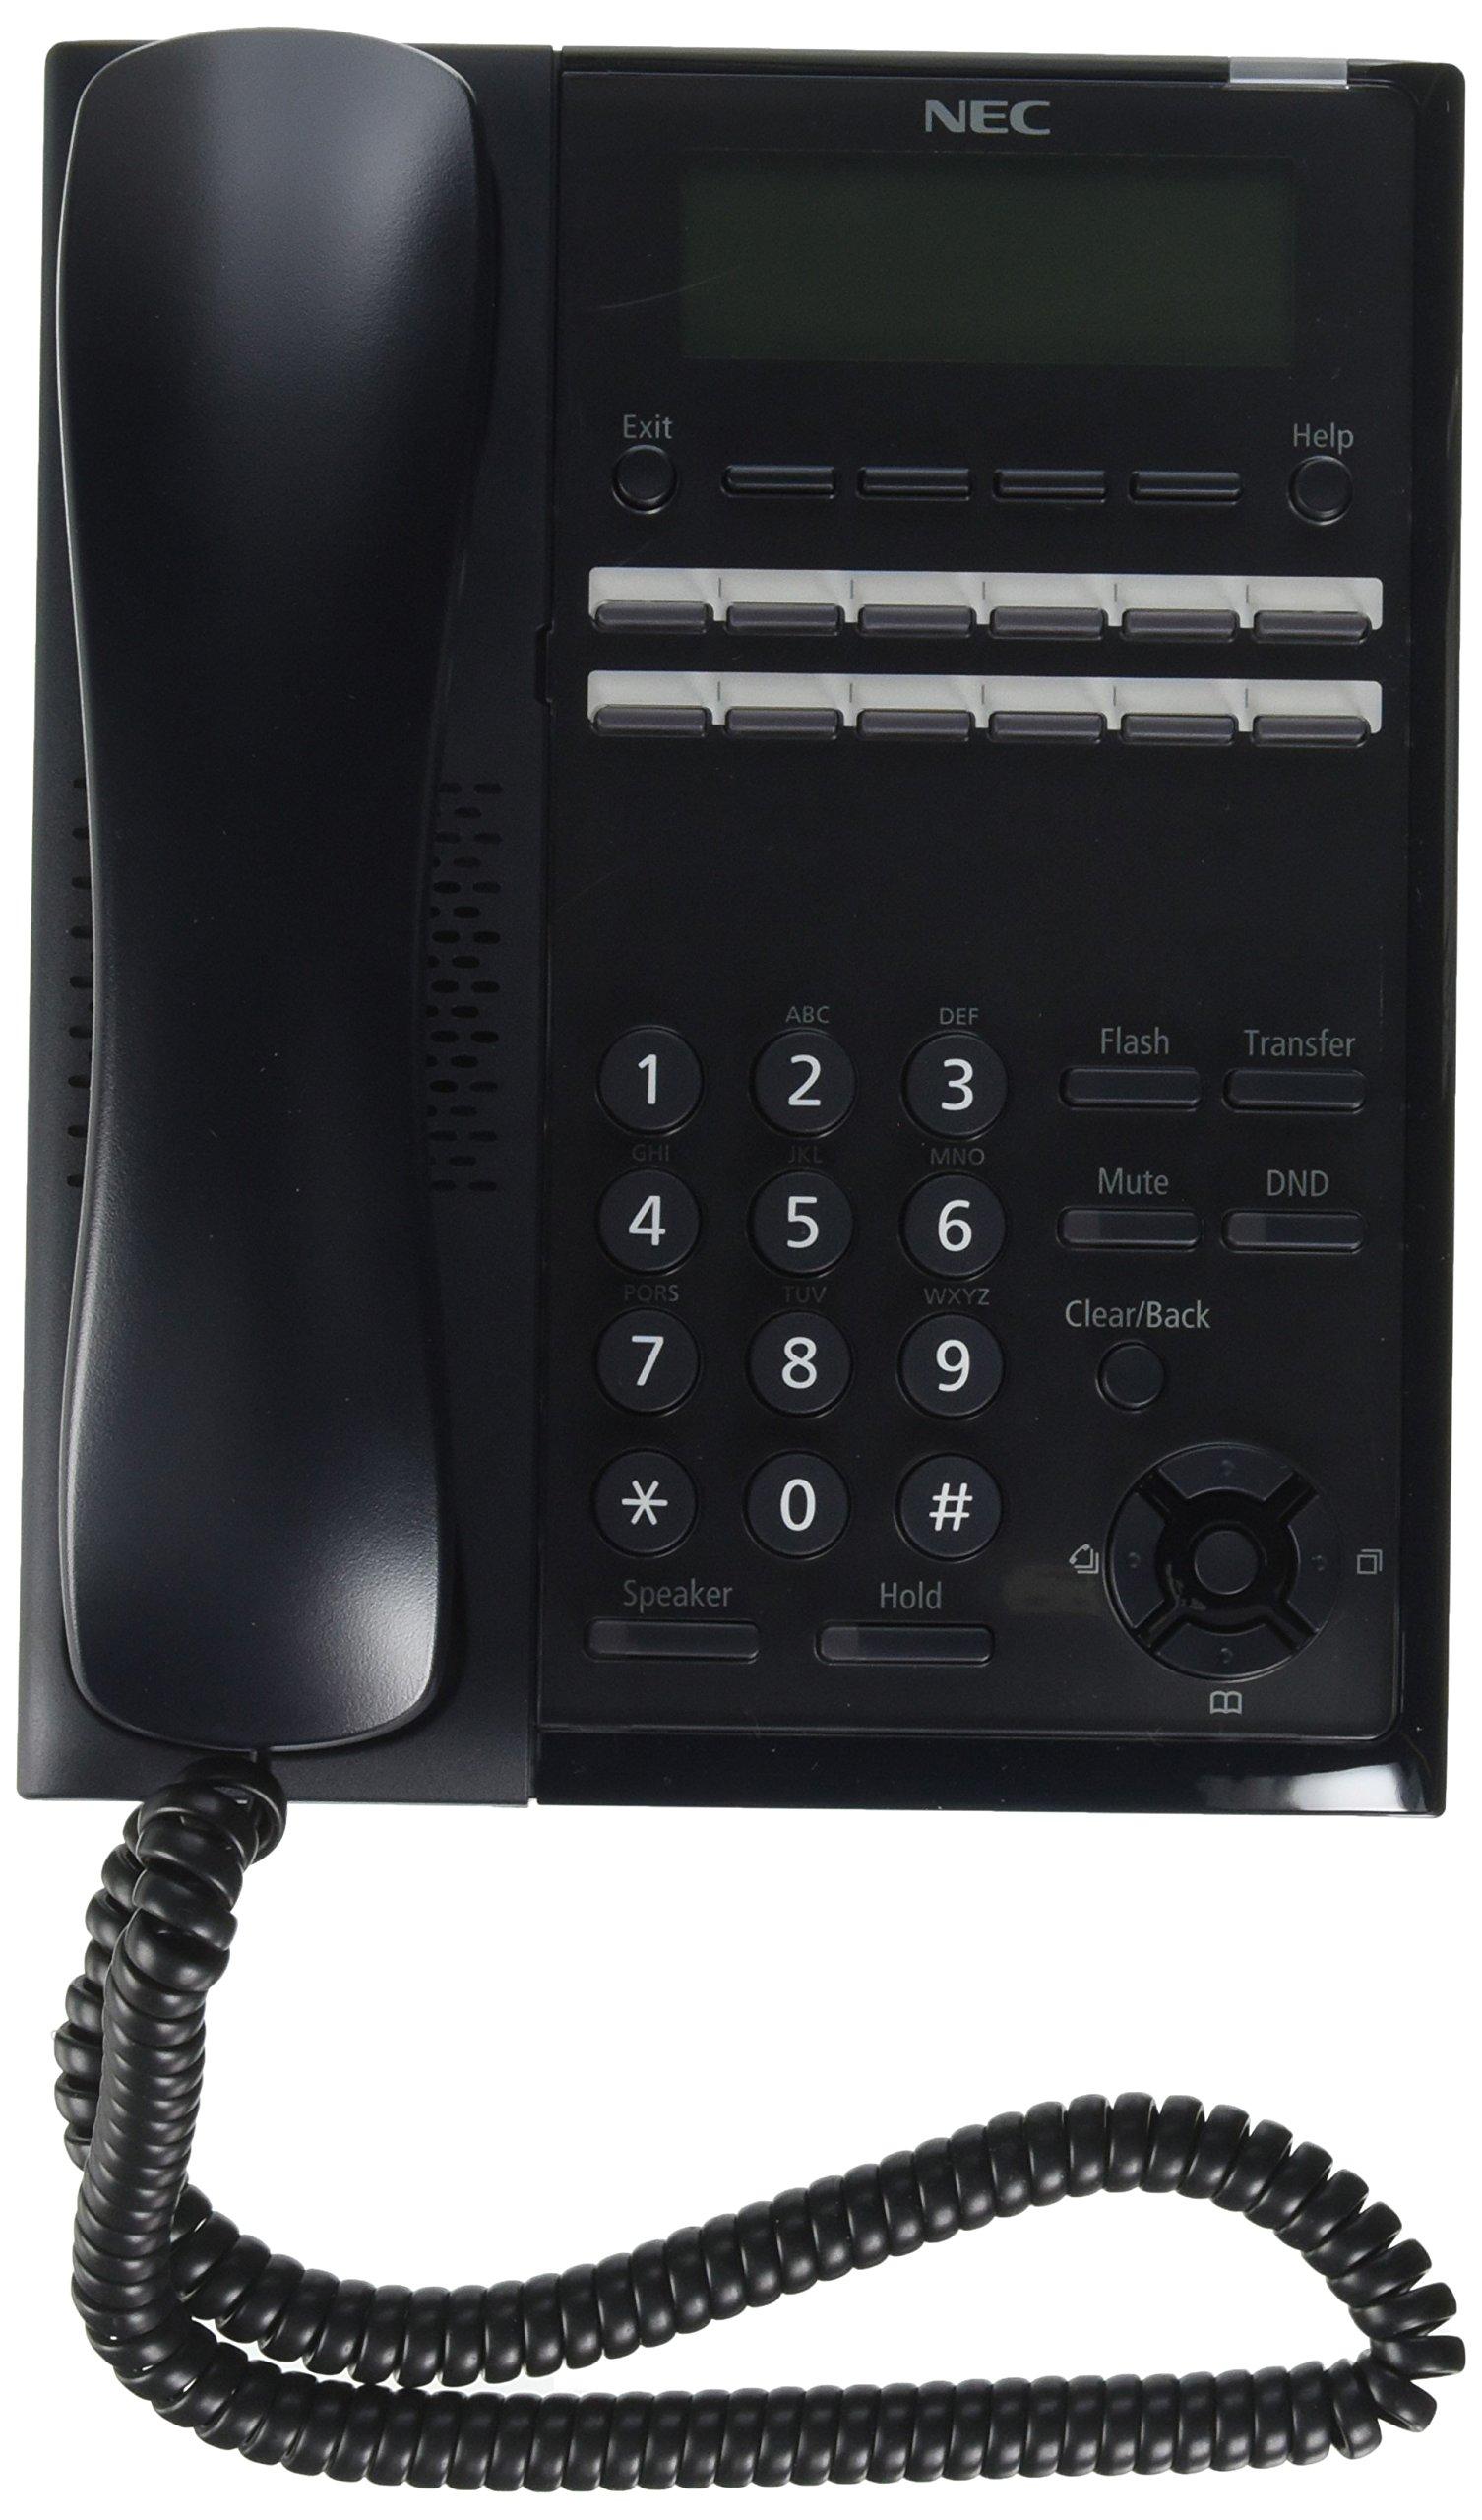 NEC SL2100 Digital 12-Button Telephone - NEC-BE117451